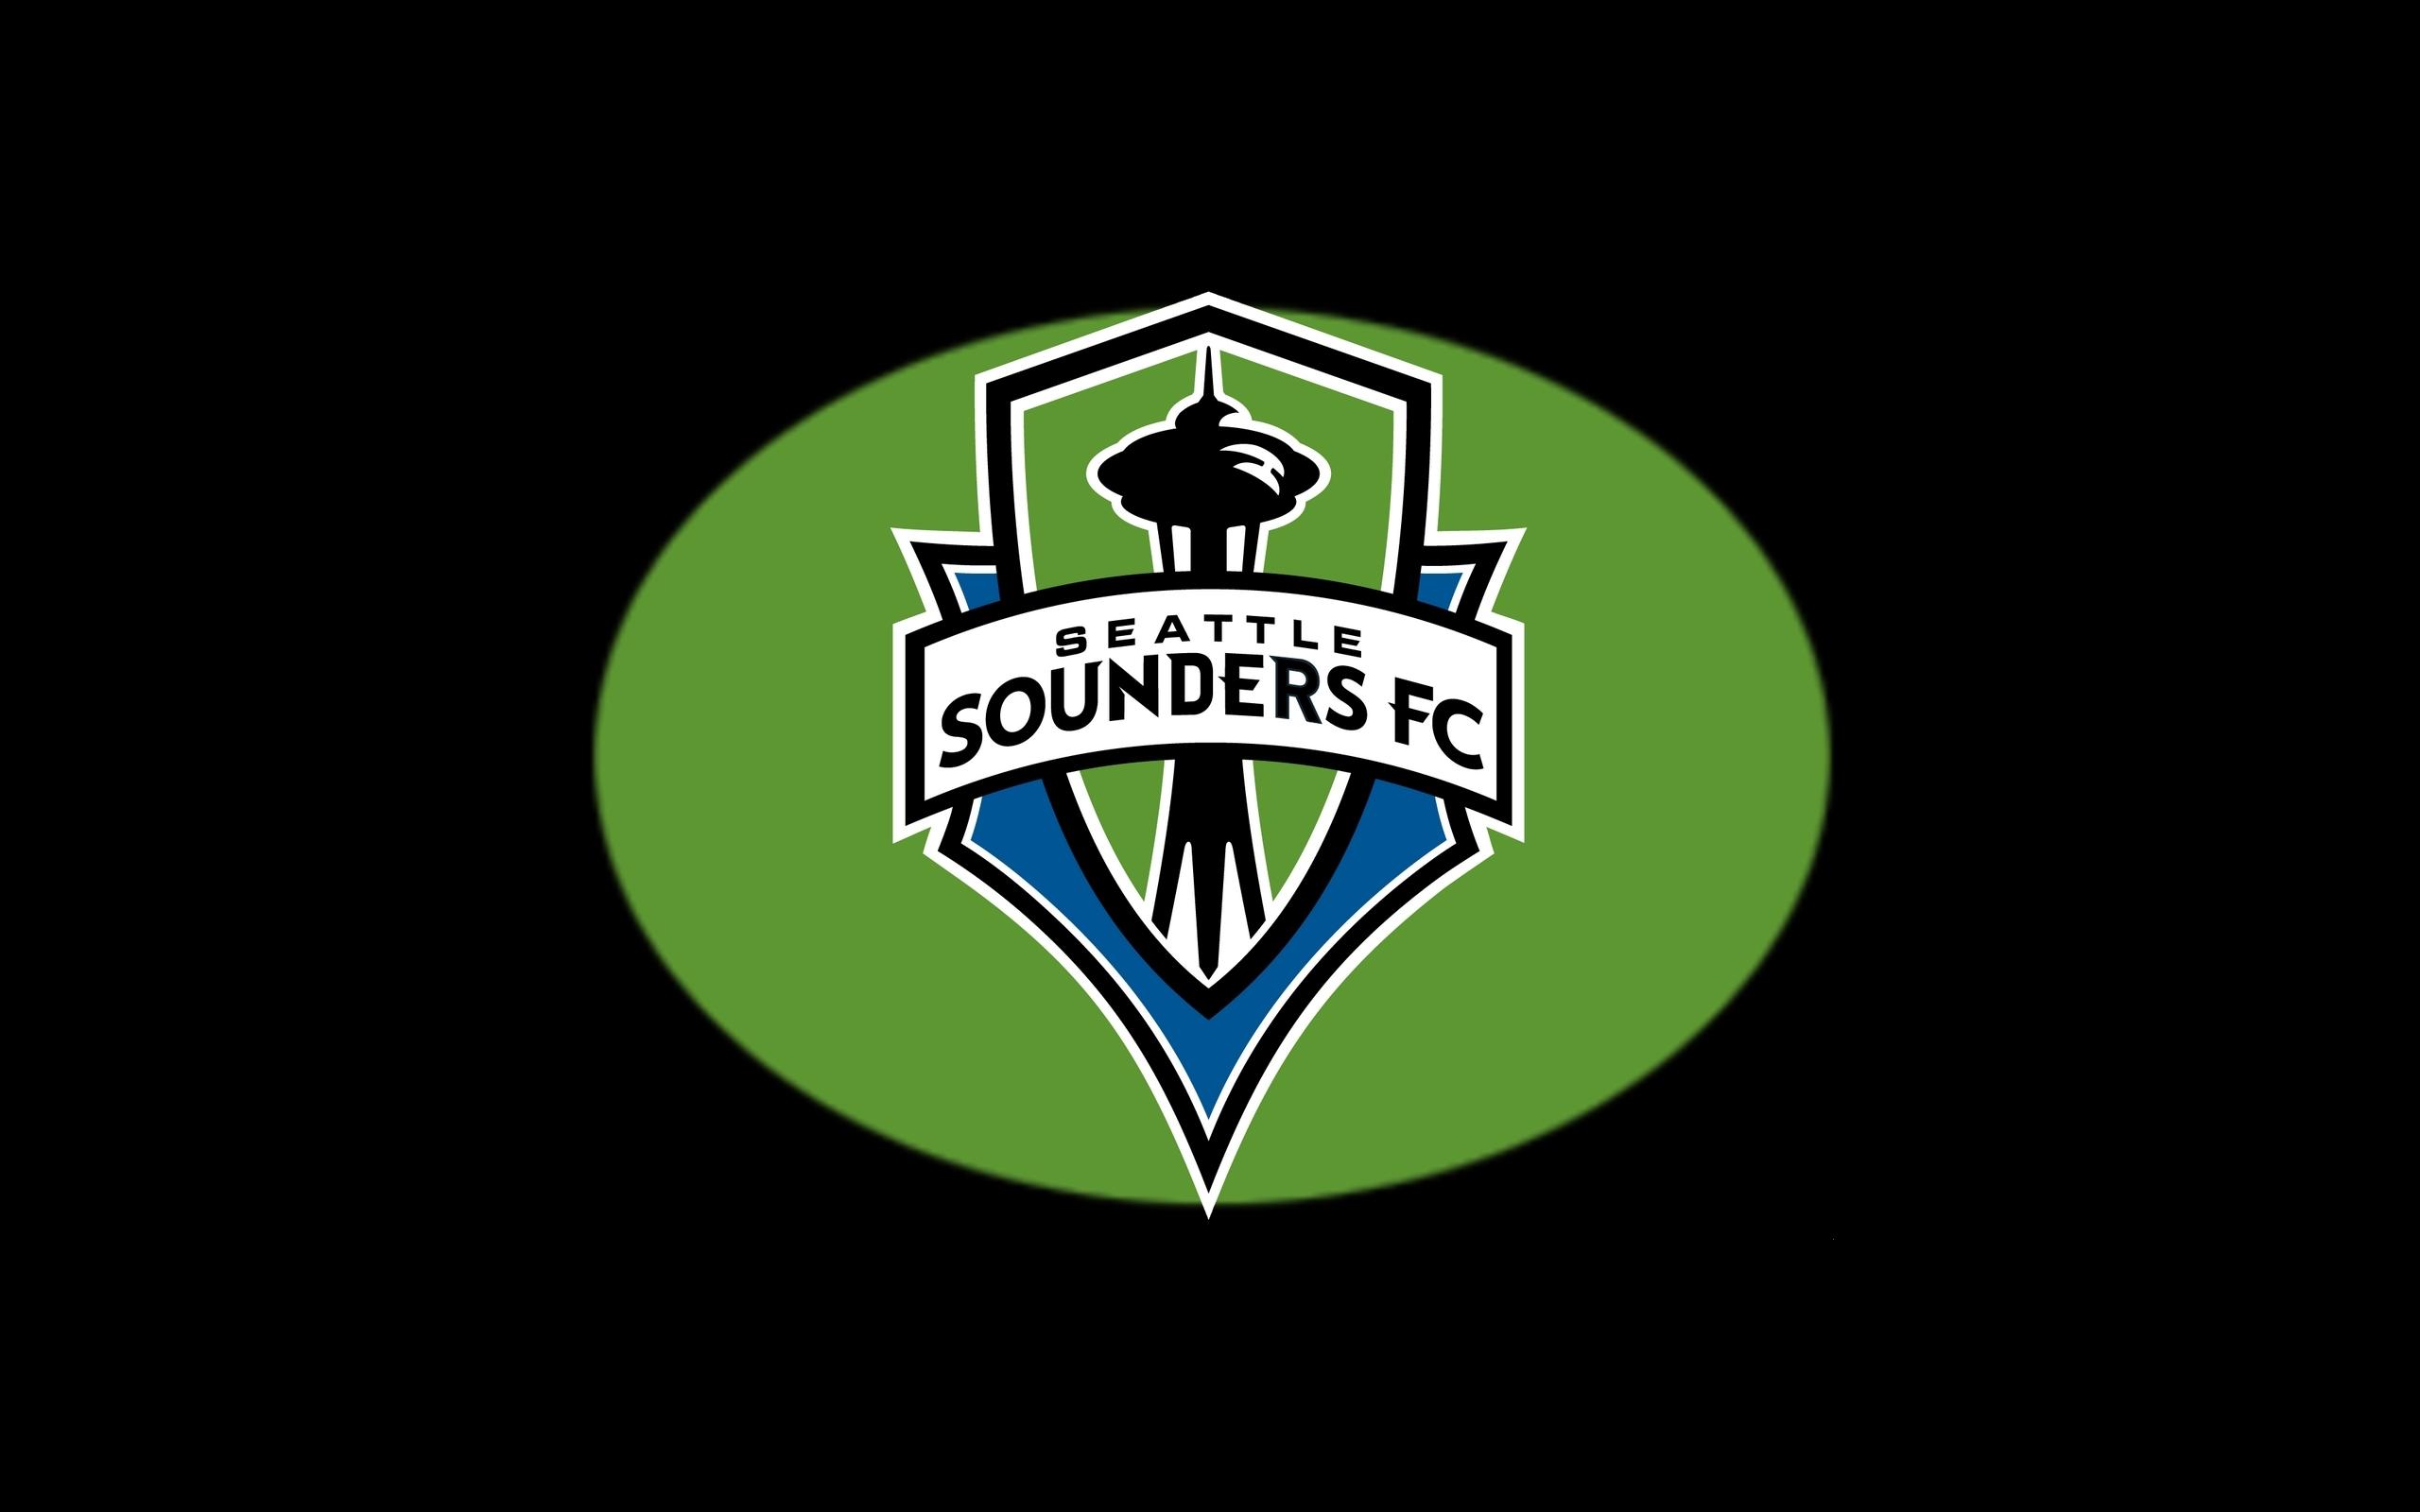 Seattle Sounders Fc Mls Soccer Sports Wallpaper 2560x1600 1188803 Wallpaperup